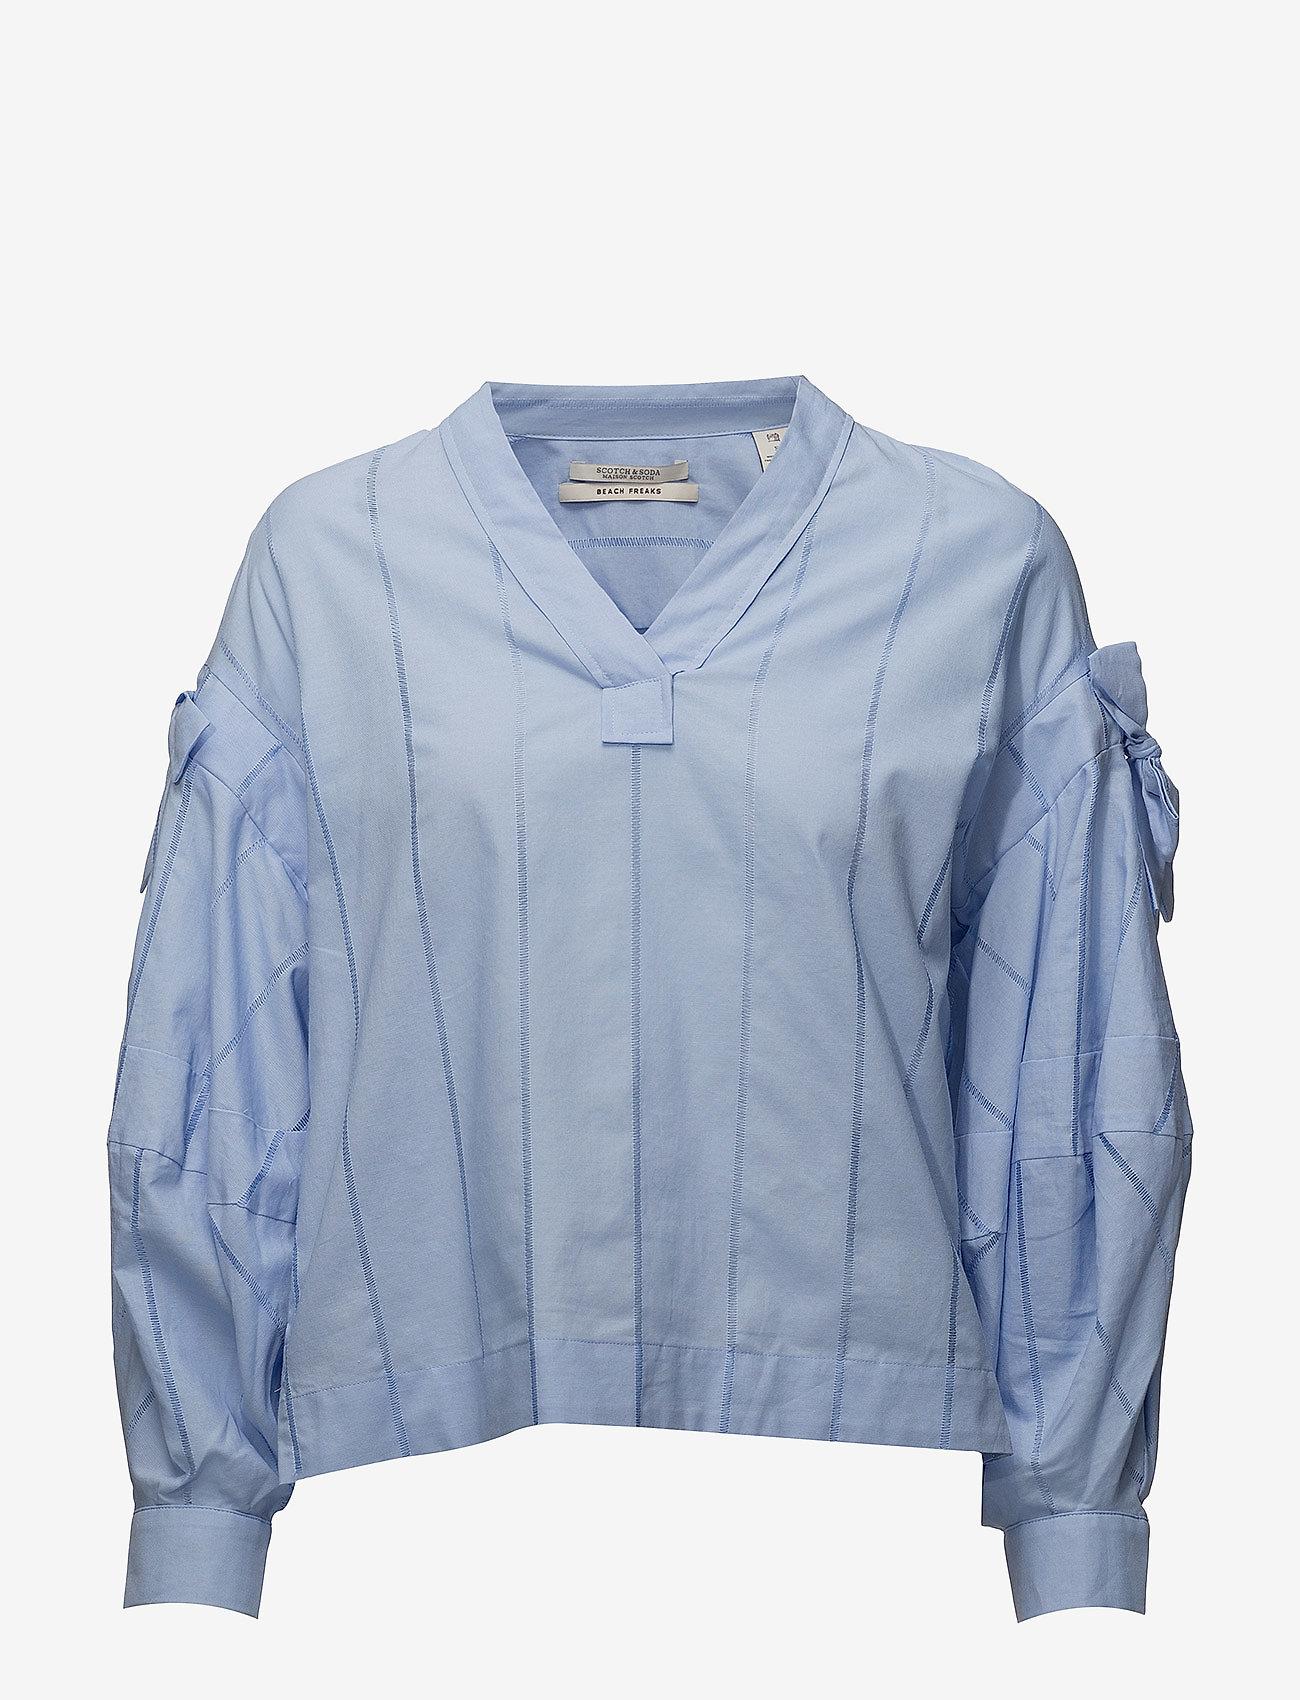 Scotch & Soda - V-neck cotton top - pitkähihaiset t-paidat - sky blue